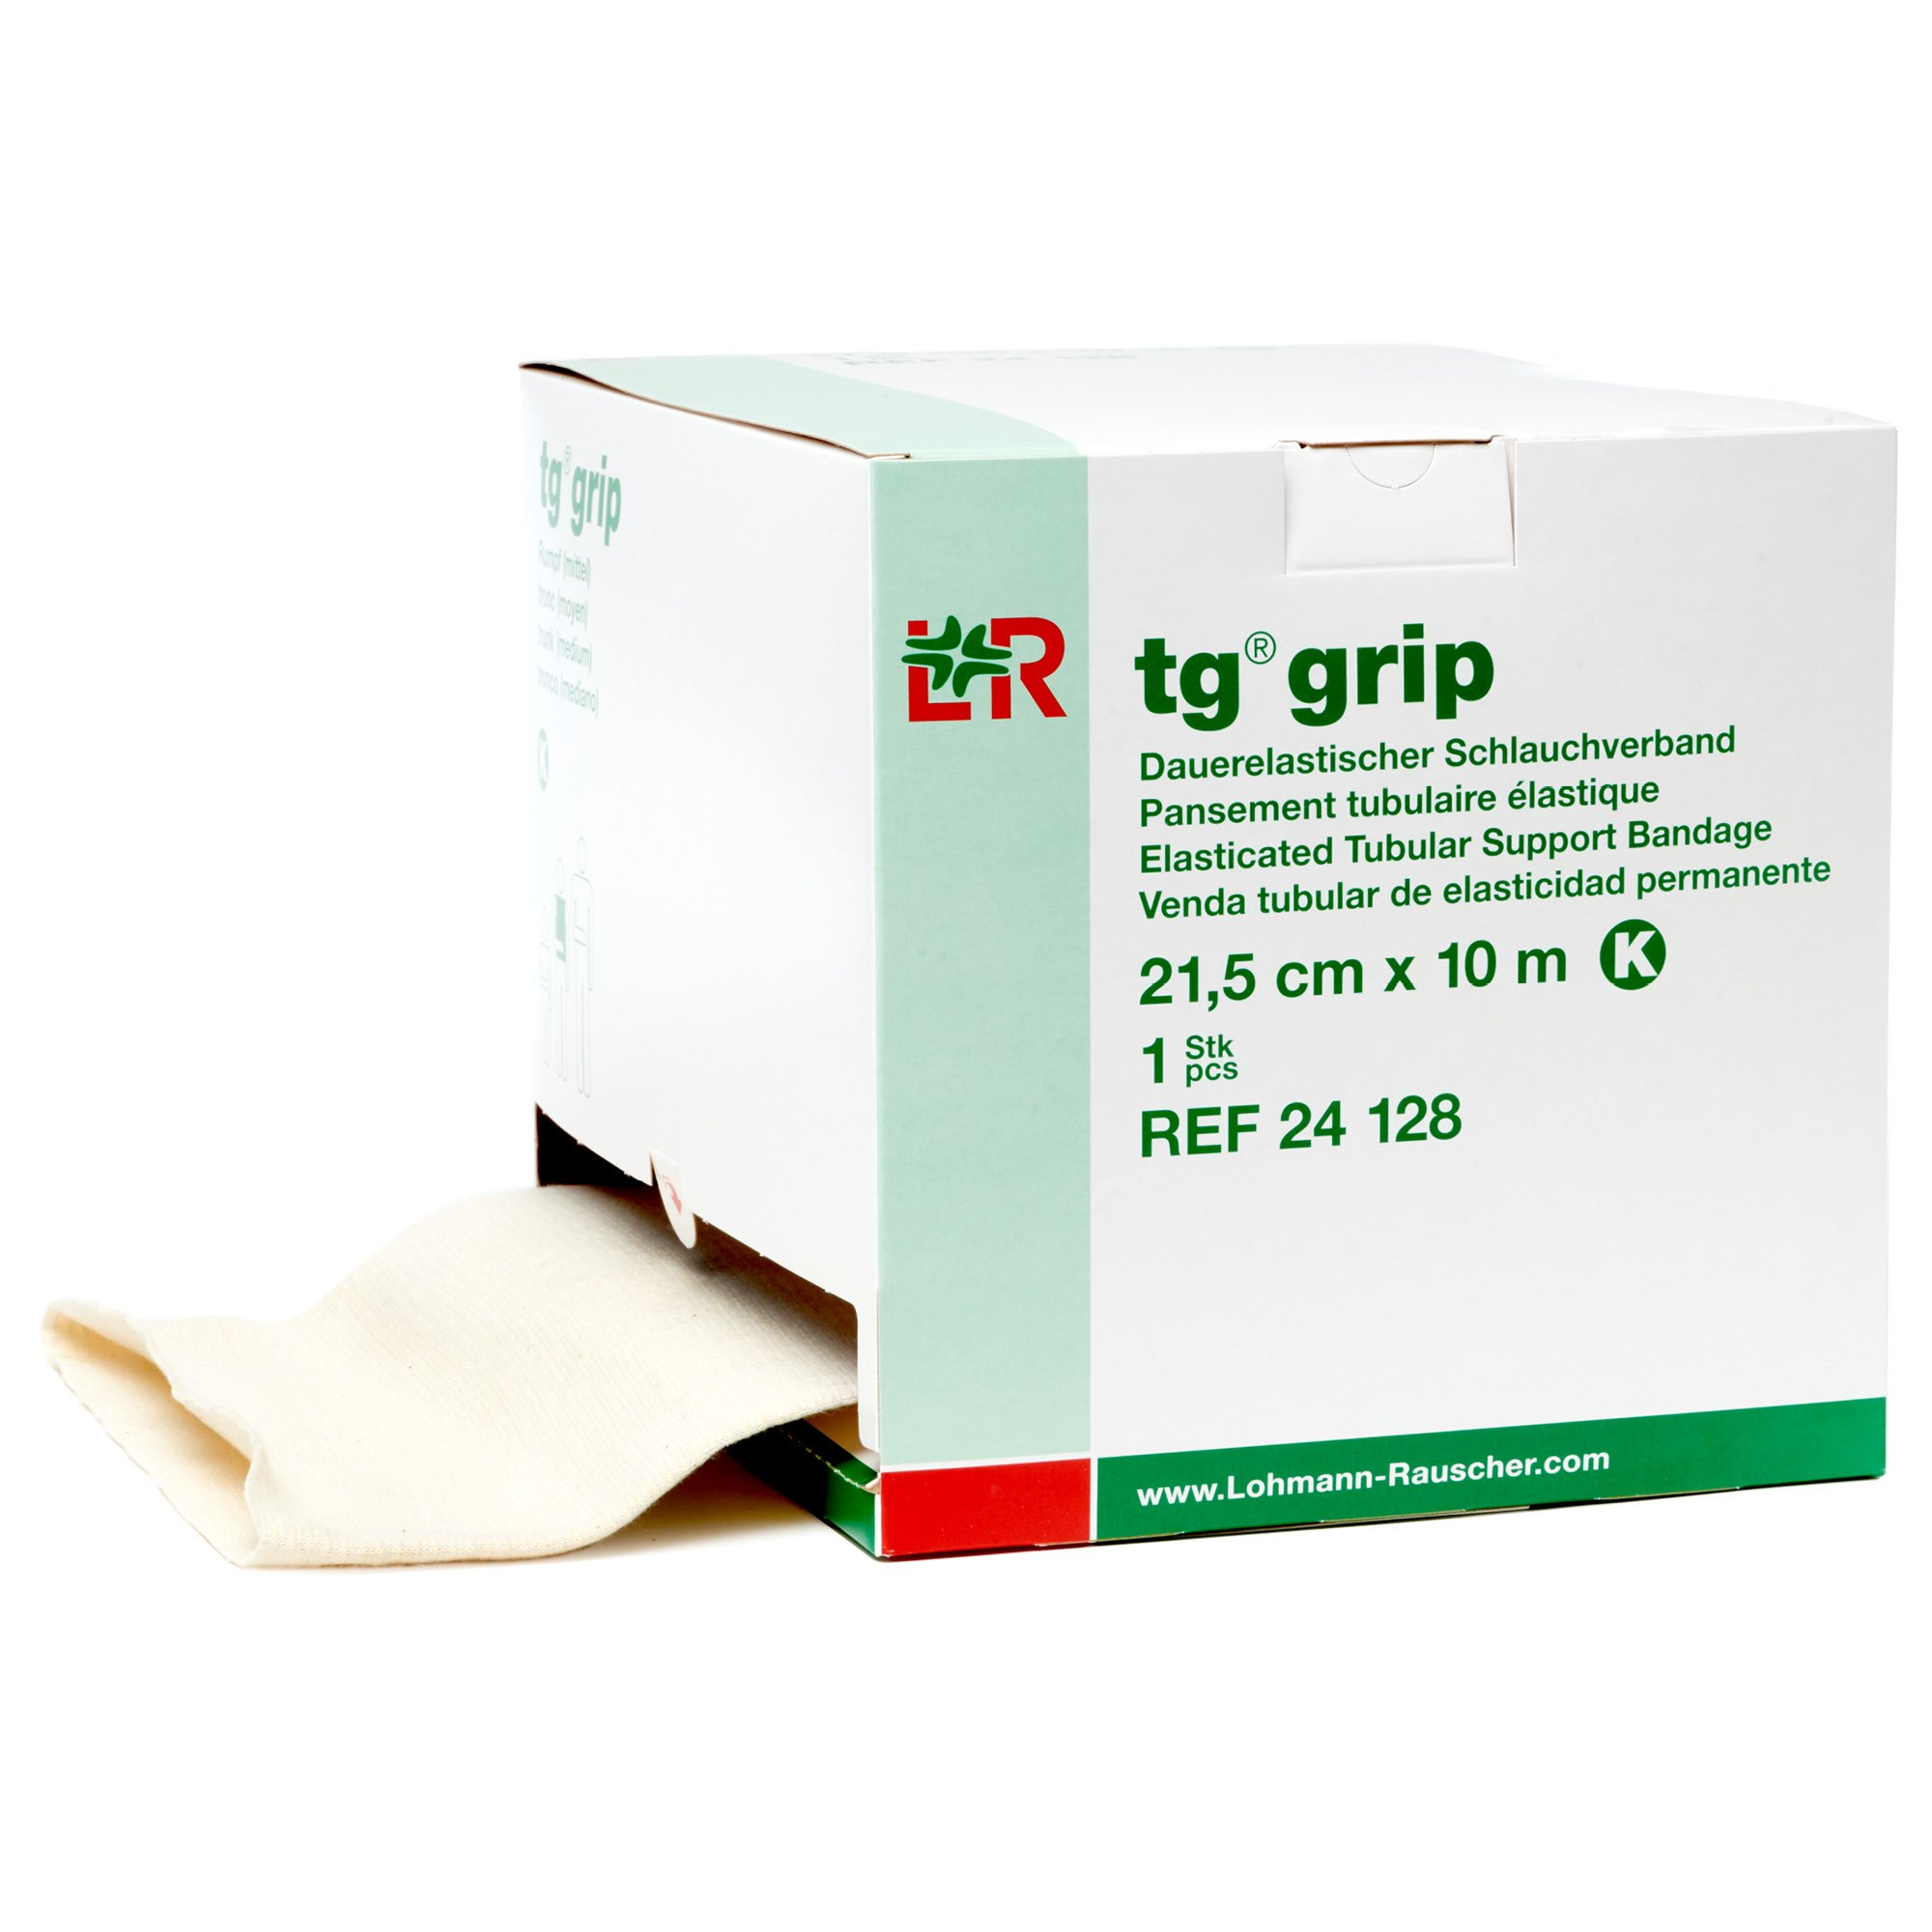 tg Grip Elastic Tubular Compression Bandage, Seamless Tube Stockinette Wrap for Retention, Lymphedema, Swelling, 85% Cotton, Washable & Reusable, Size K